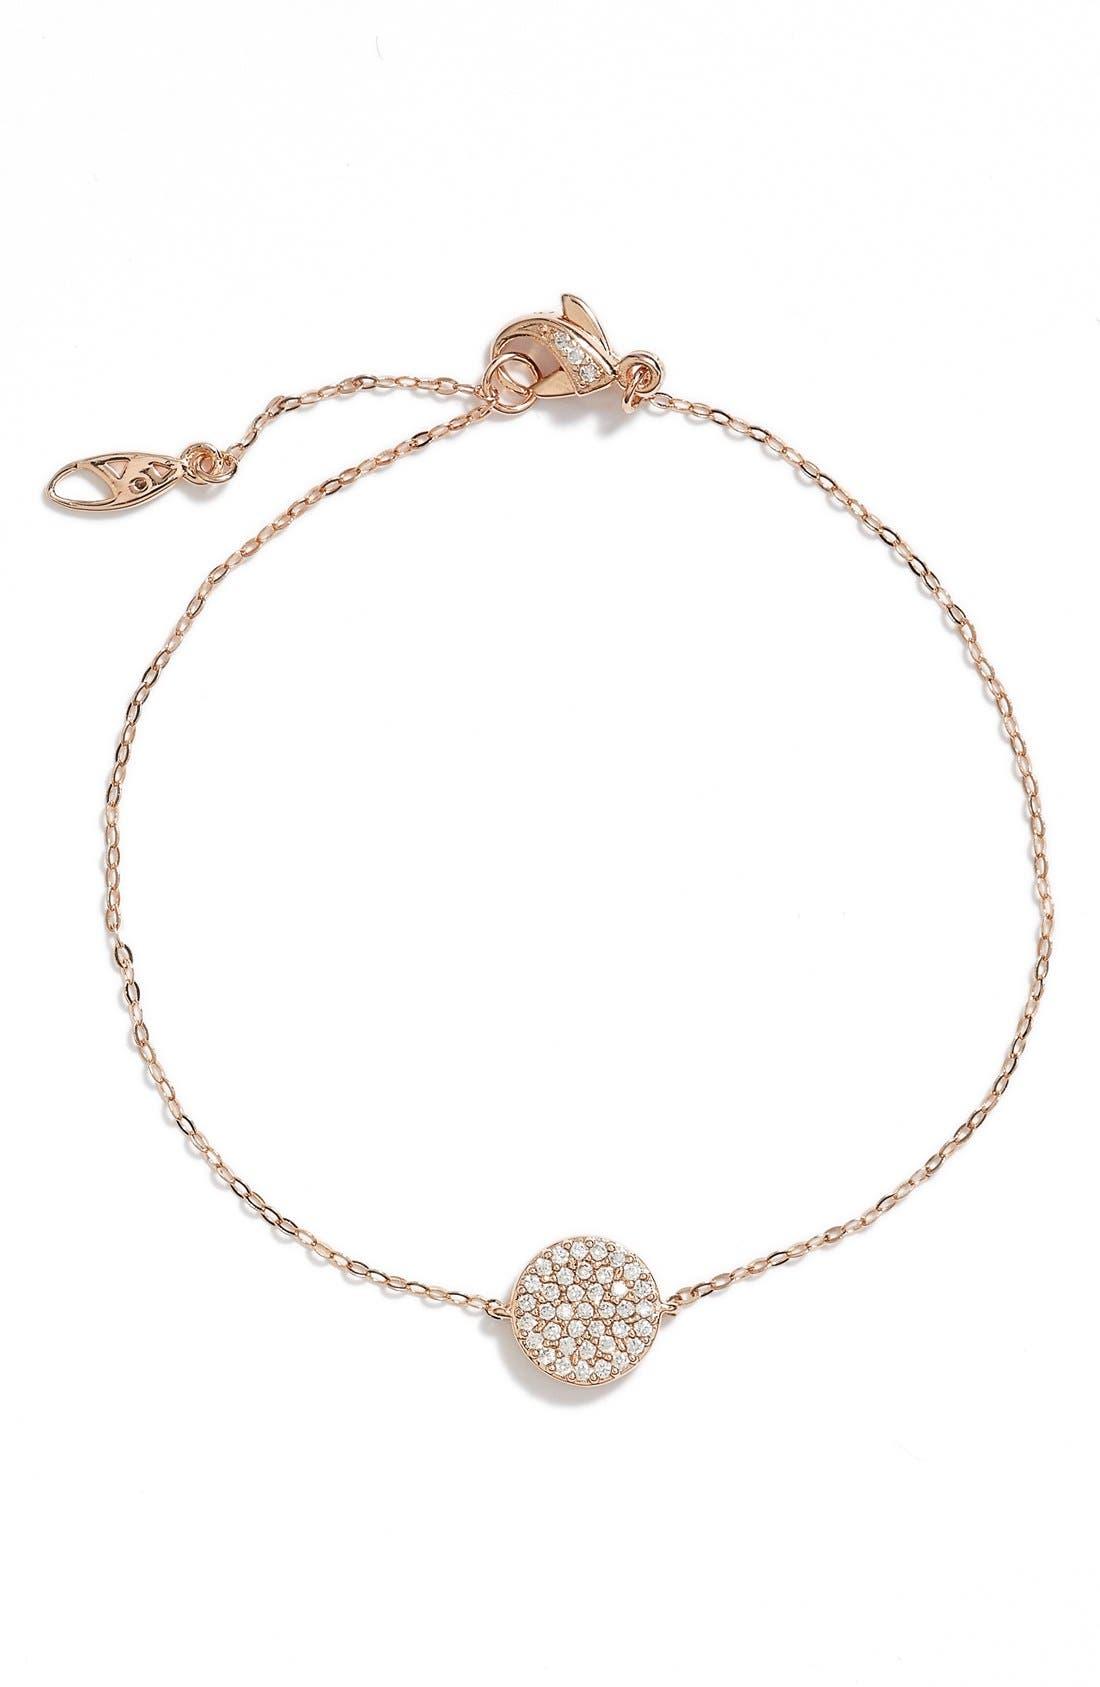 Alternate Image 1 Selected - Nadri 'Geo' Station Bracelet